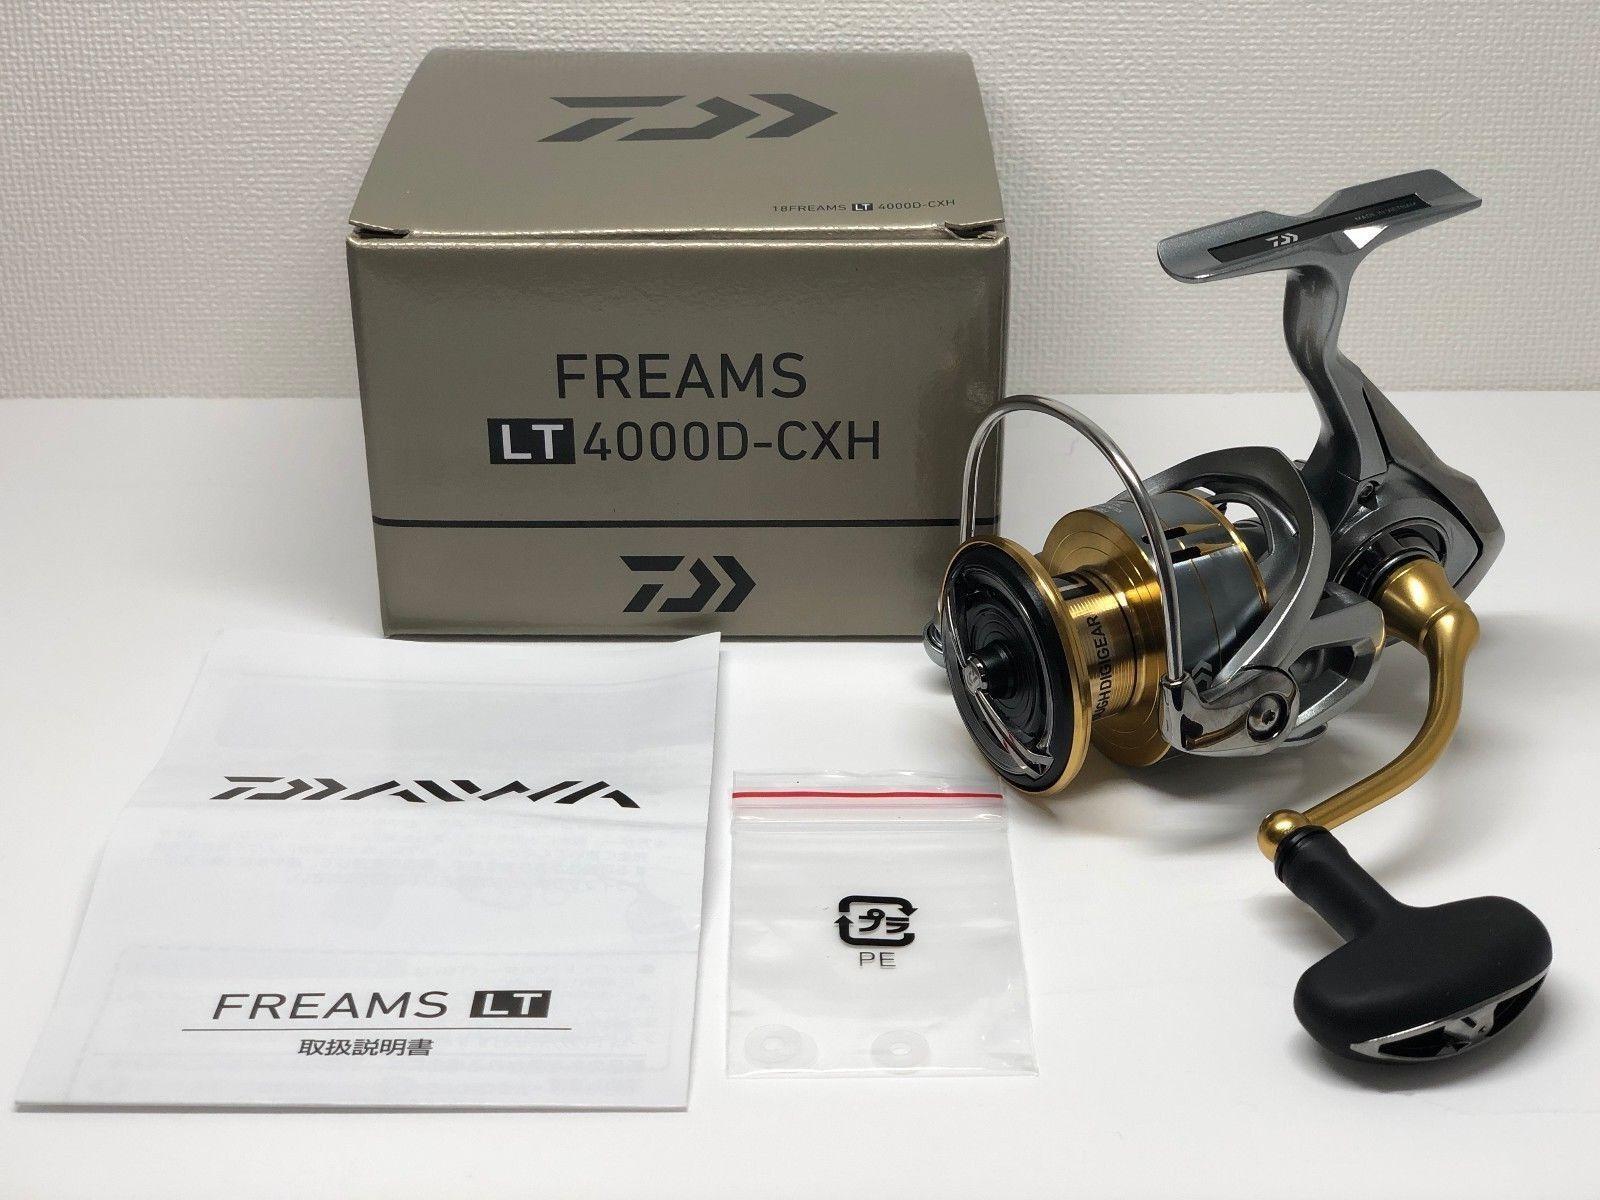 DAIWA 18 FREAMS LT 4000D-CXH  - Free Shipping from Japan